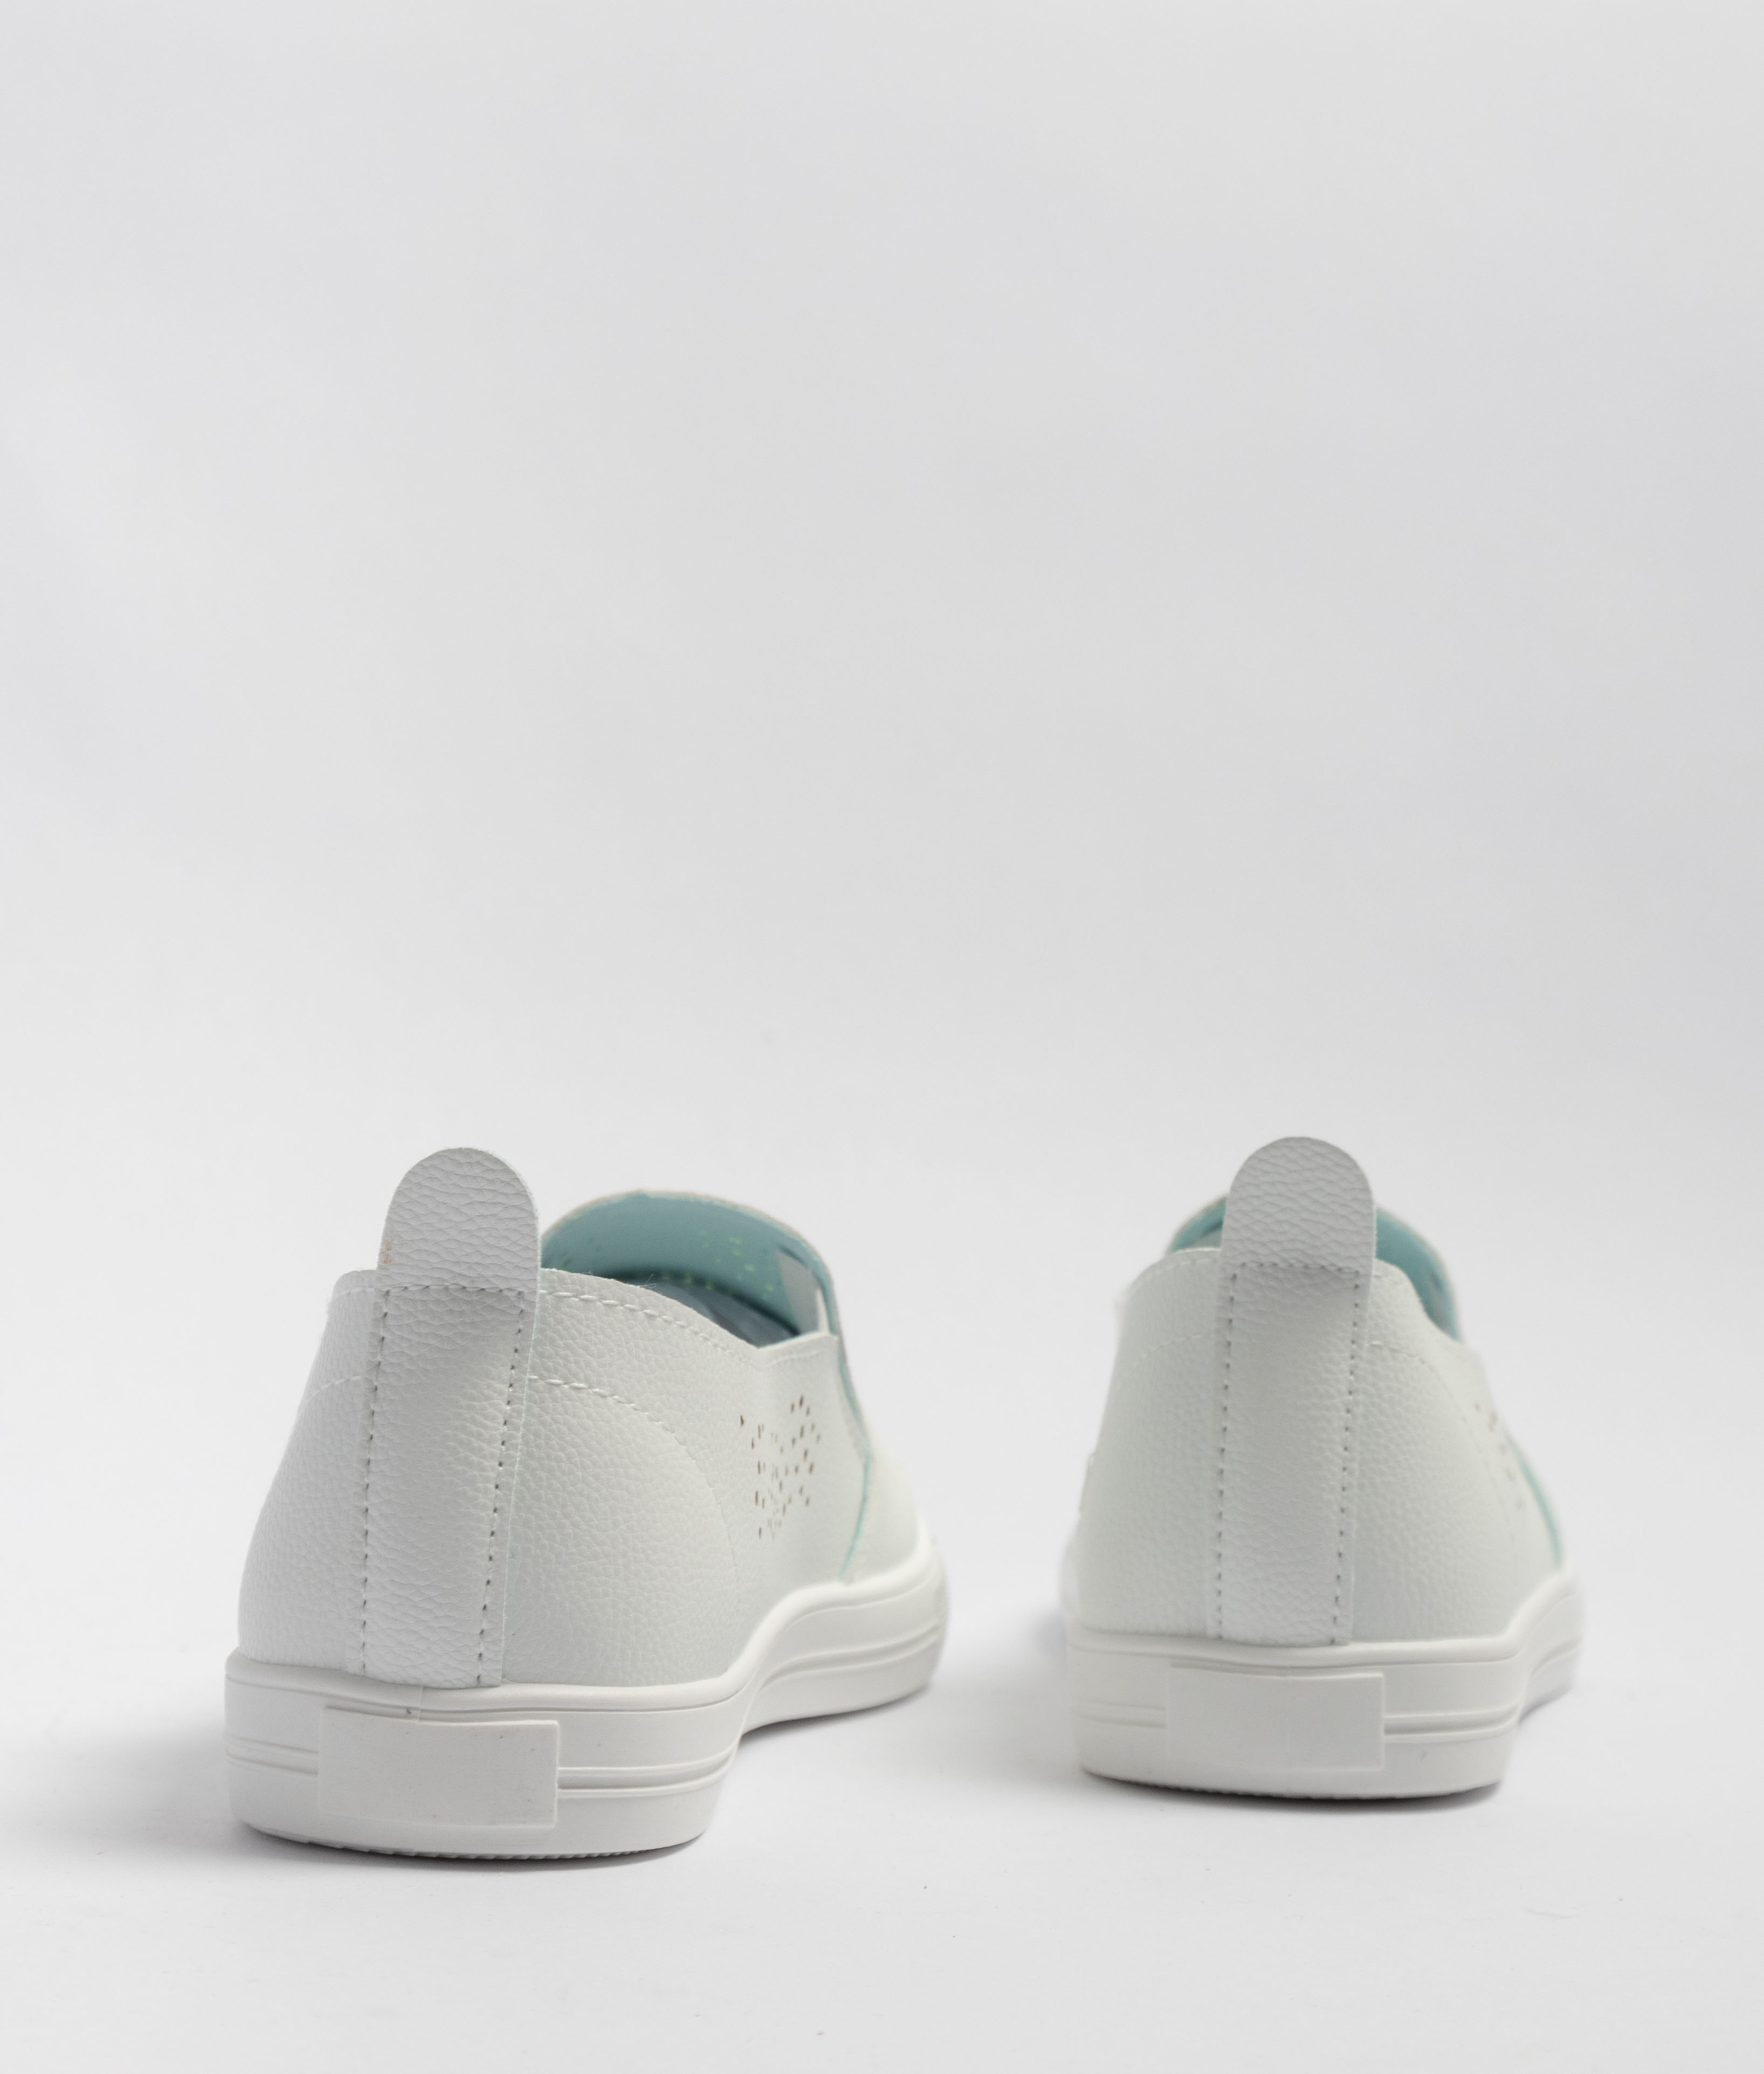 Sneakers Chery - White